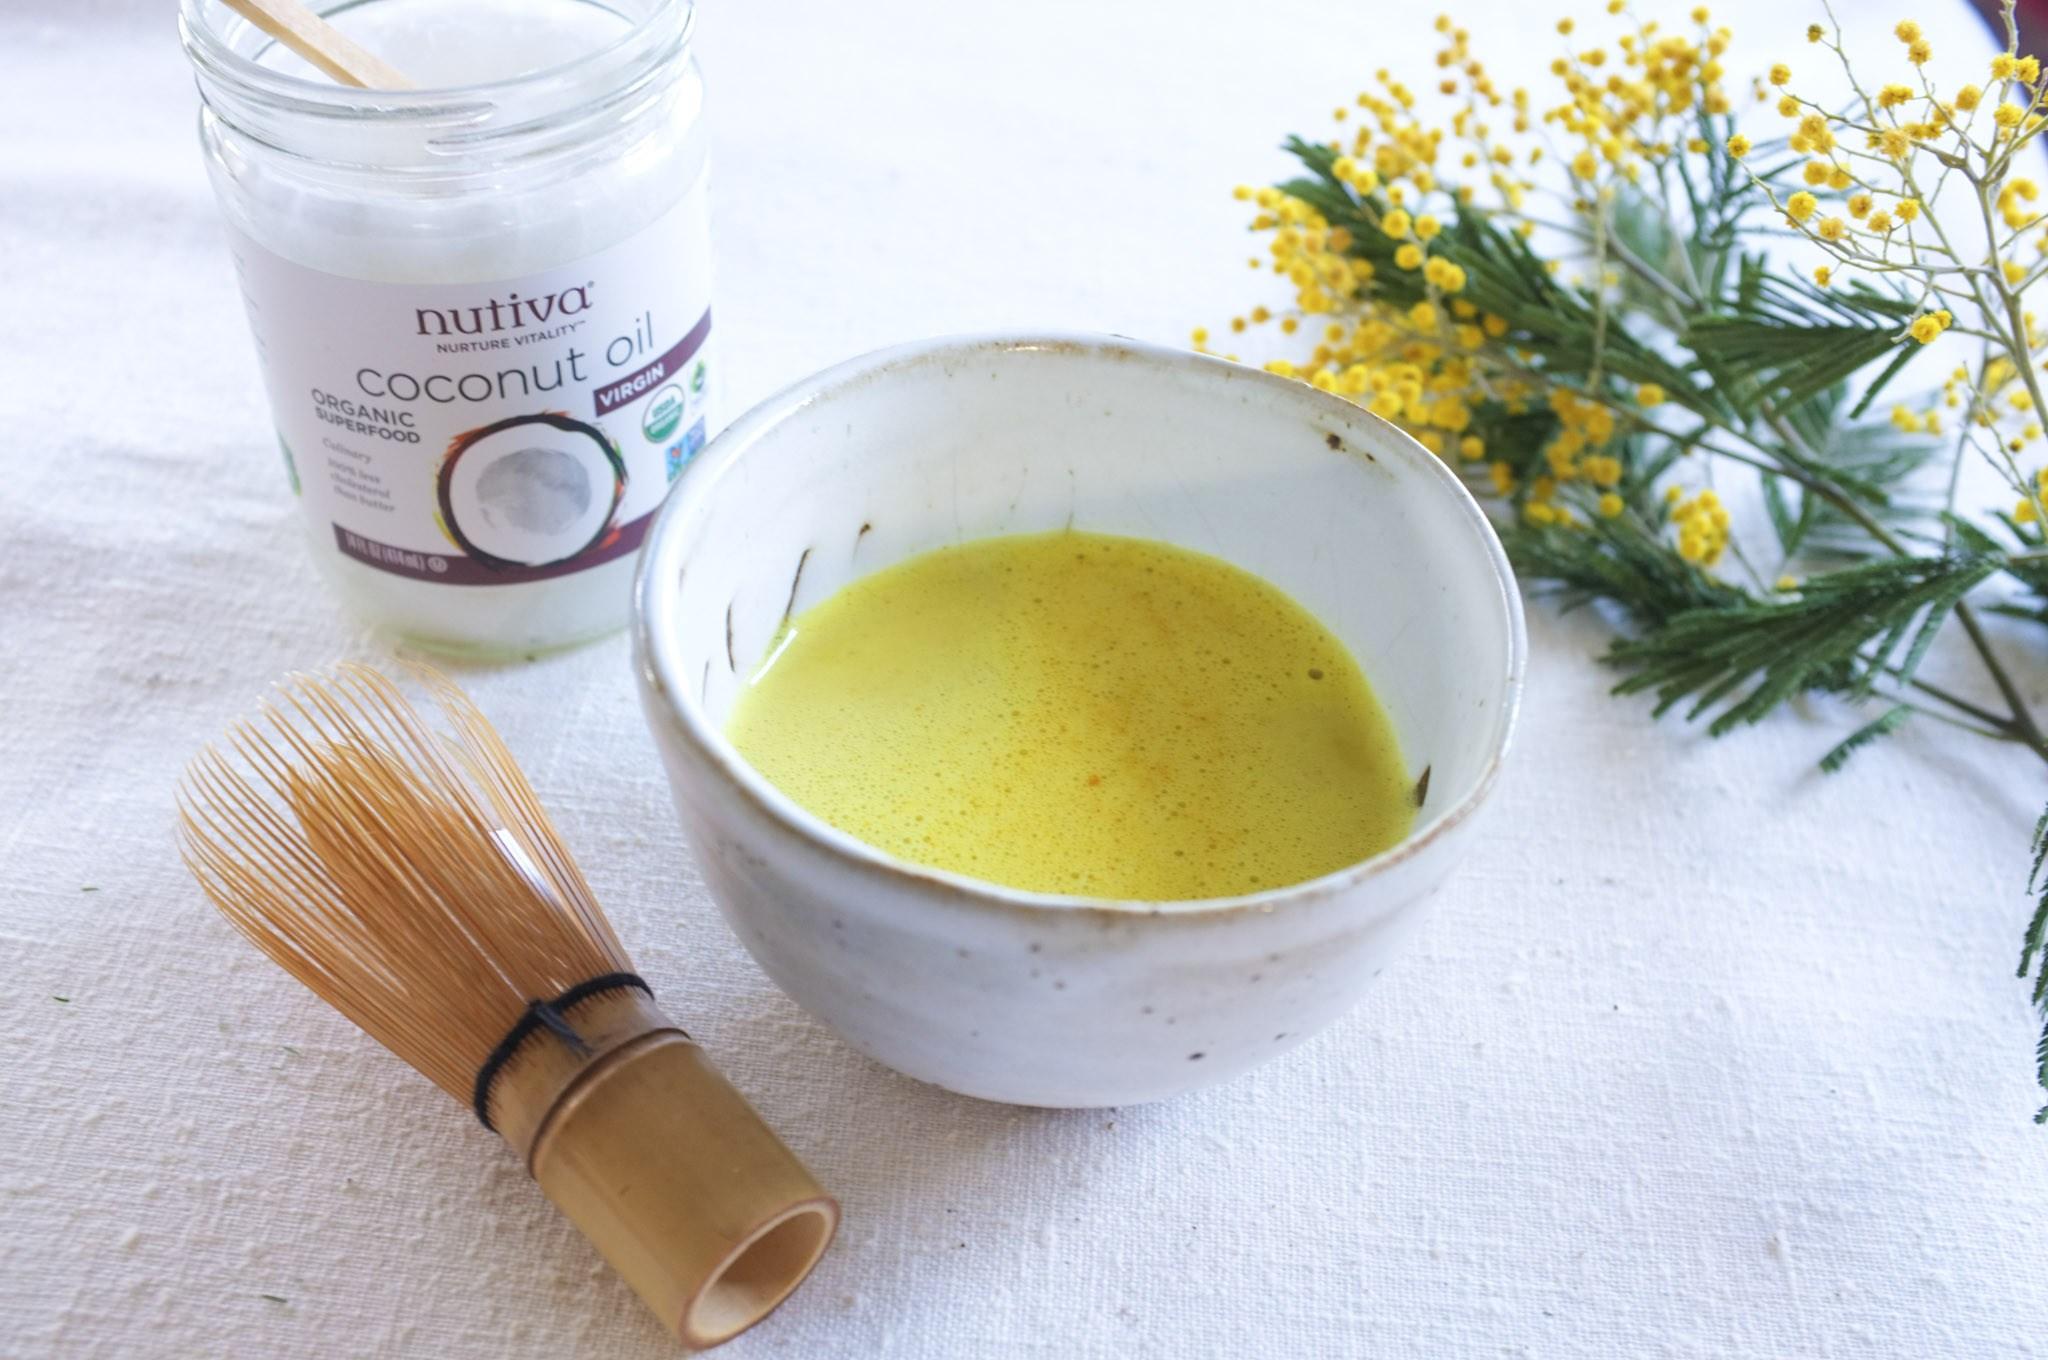 Nutiva - Golden Milk + Protein Pesto Recipe Collaboration